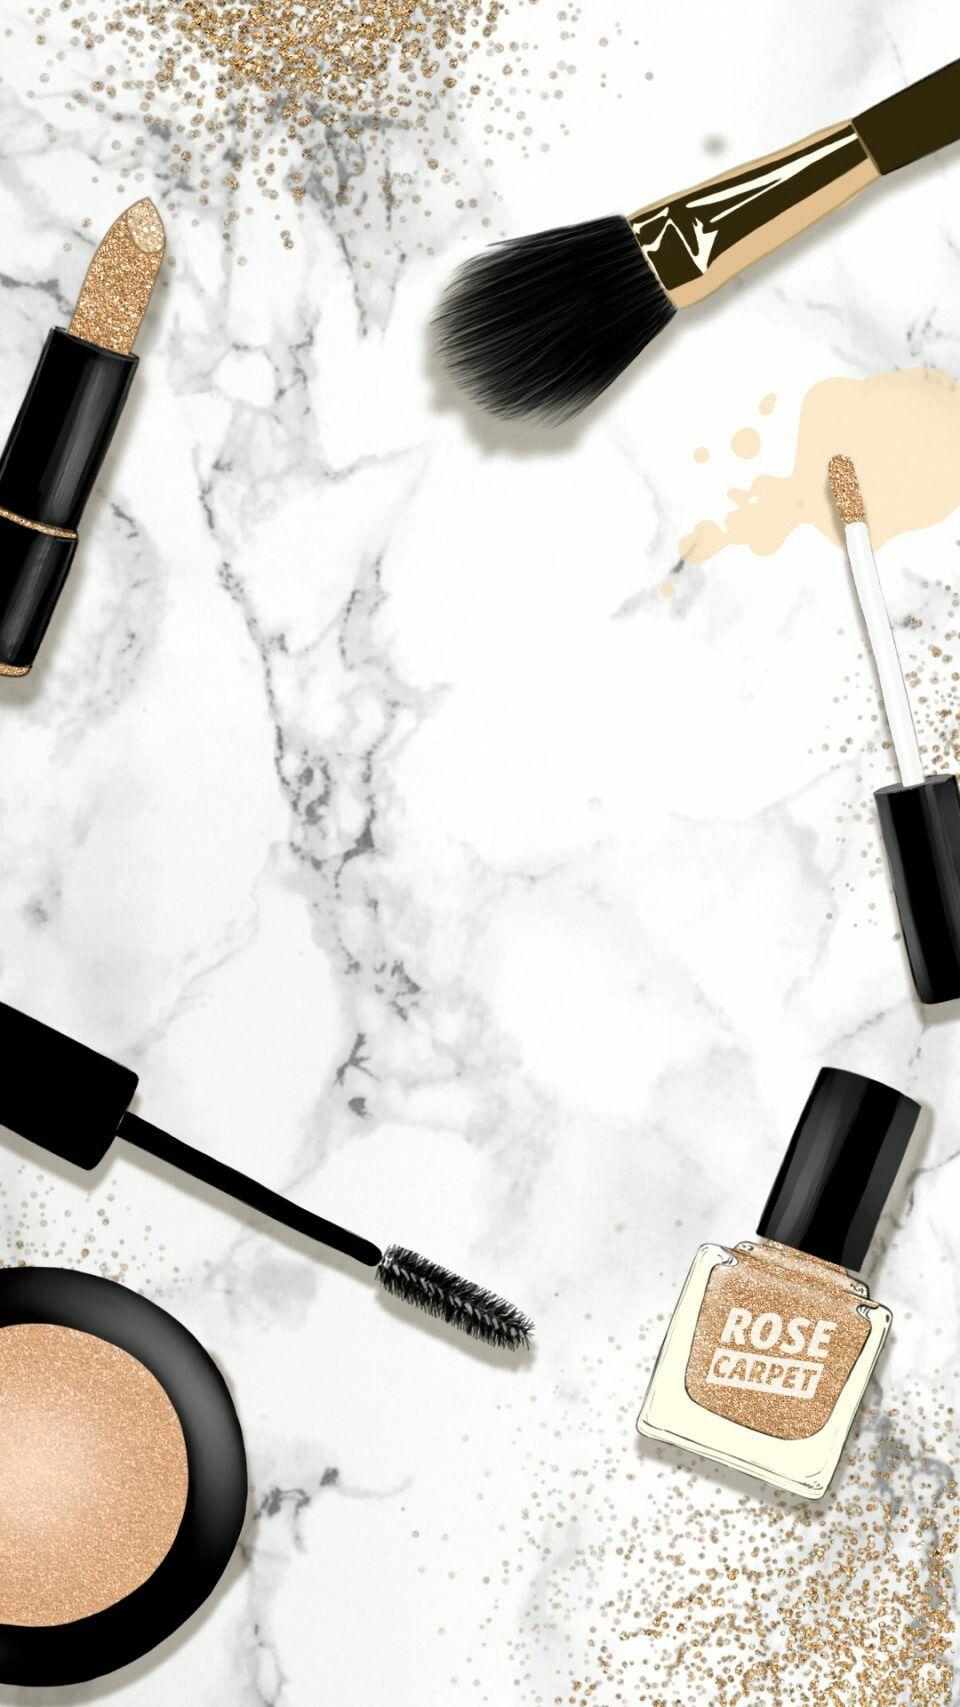 Pinterest: @EnchantedInPink♡ ♡   Backgrounds in 2019   Makeup wallpapers, Makeup backgrounds ...